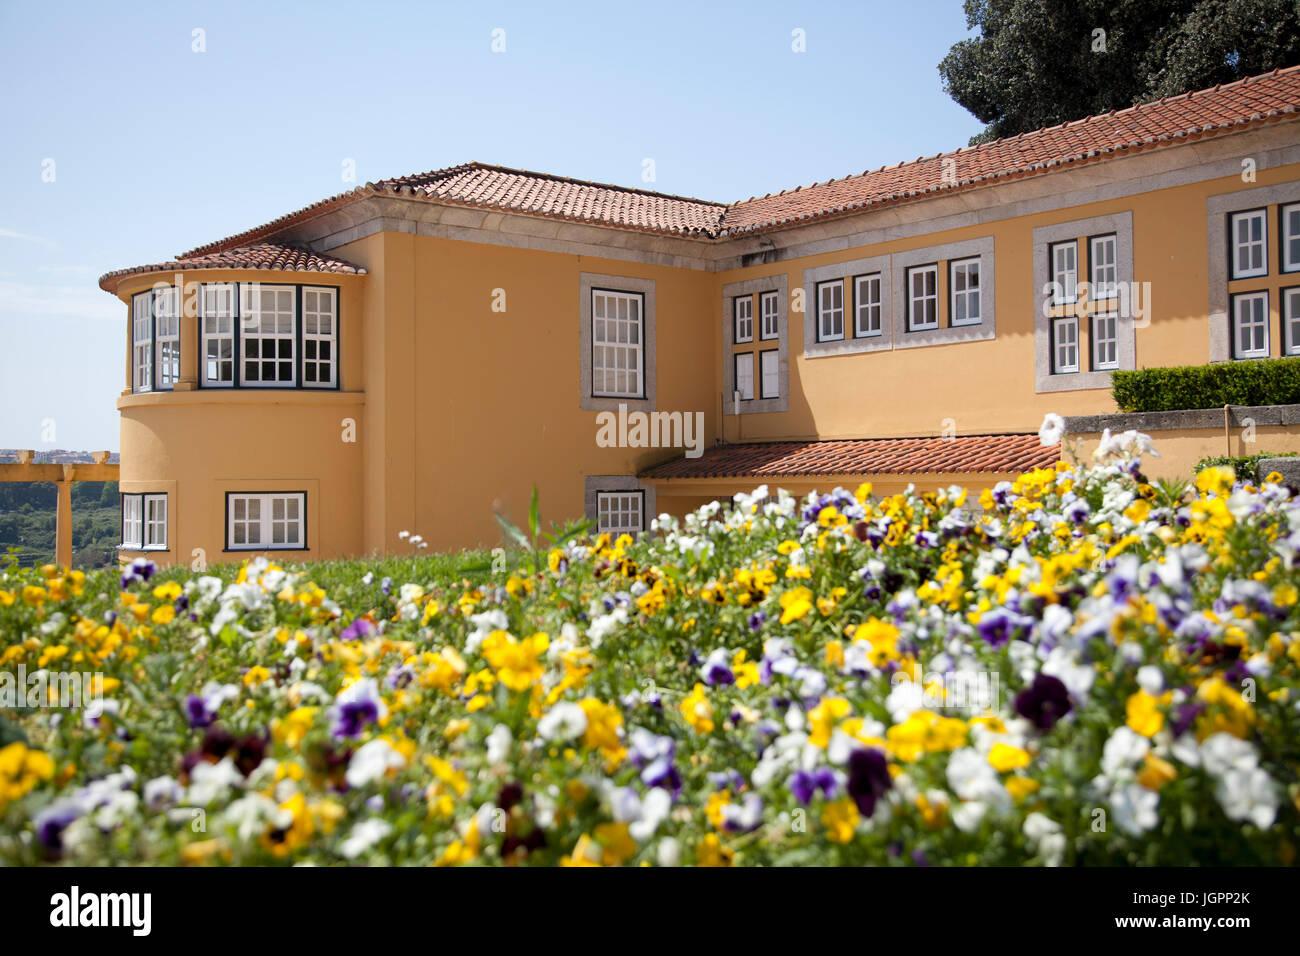 Yellow House in Palacio de Cristal Gardens in Porto - Portugal - Stock Image